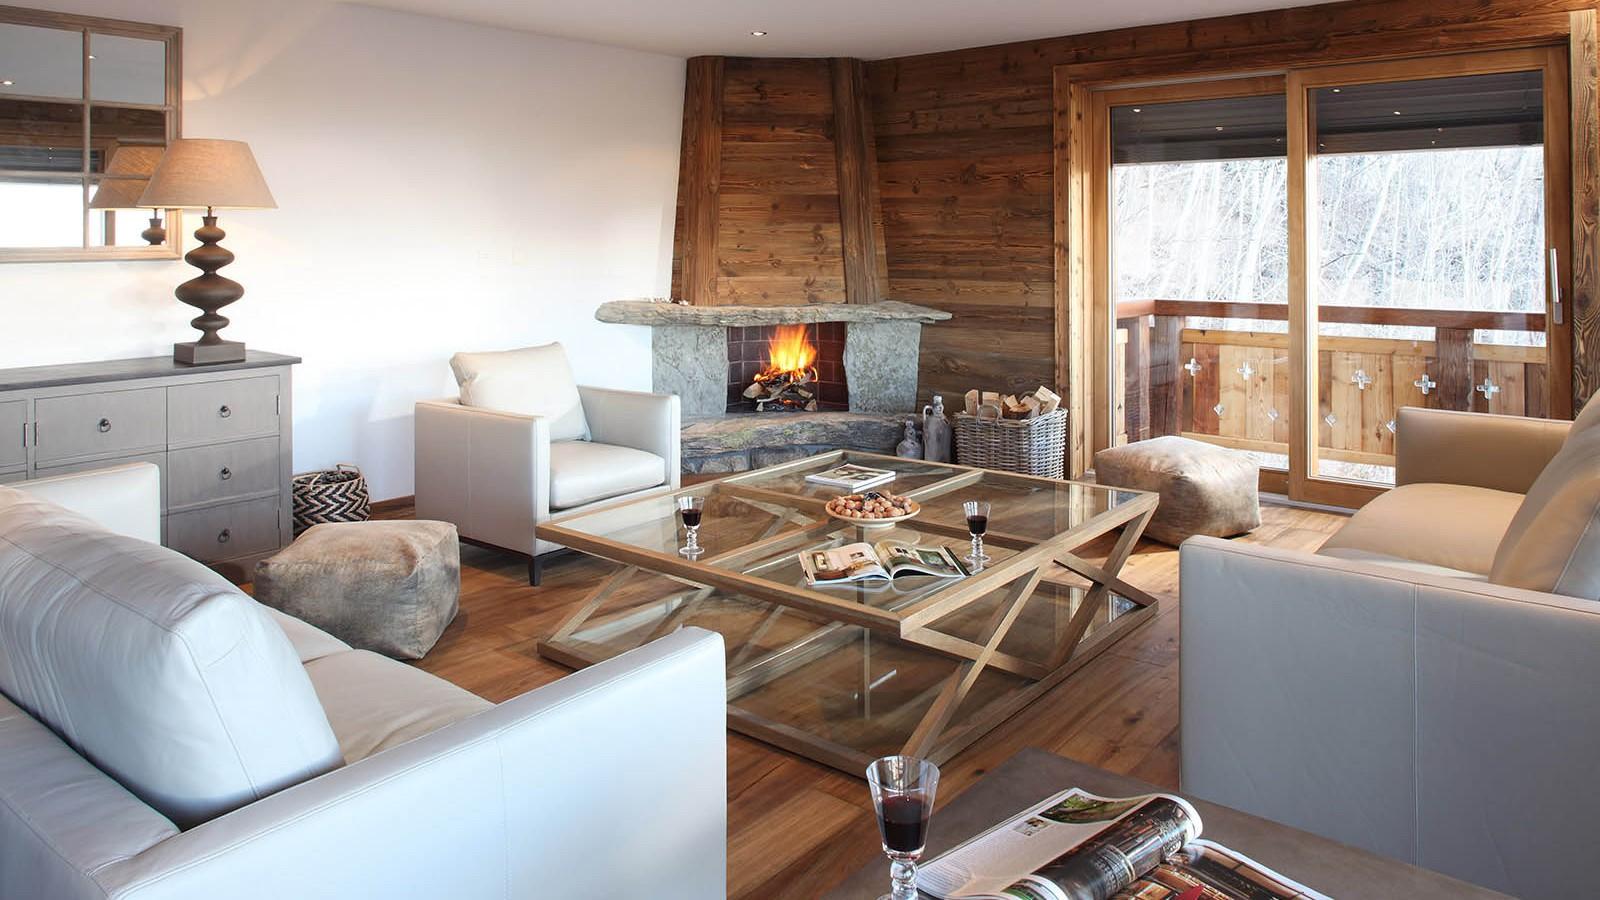 Lounge in Chalet Rosablanche, Nendaz